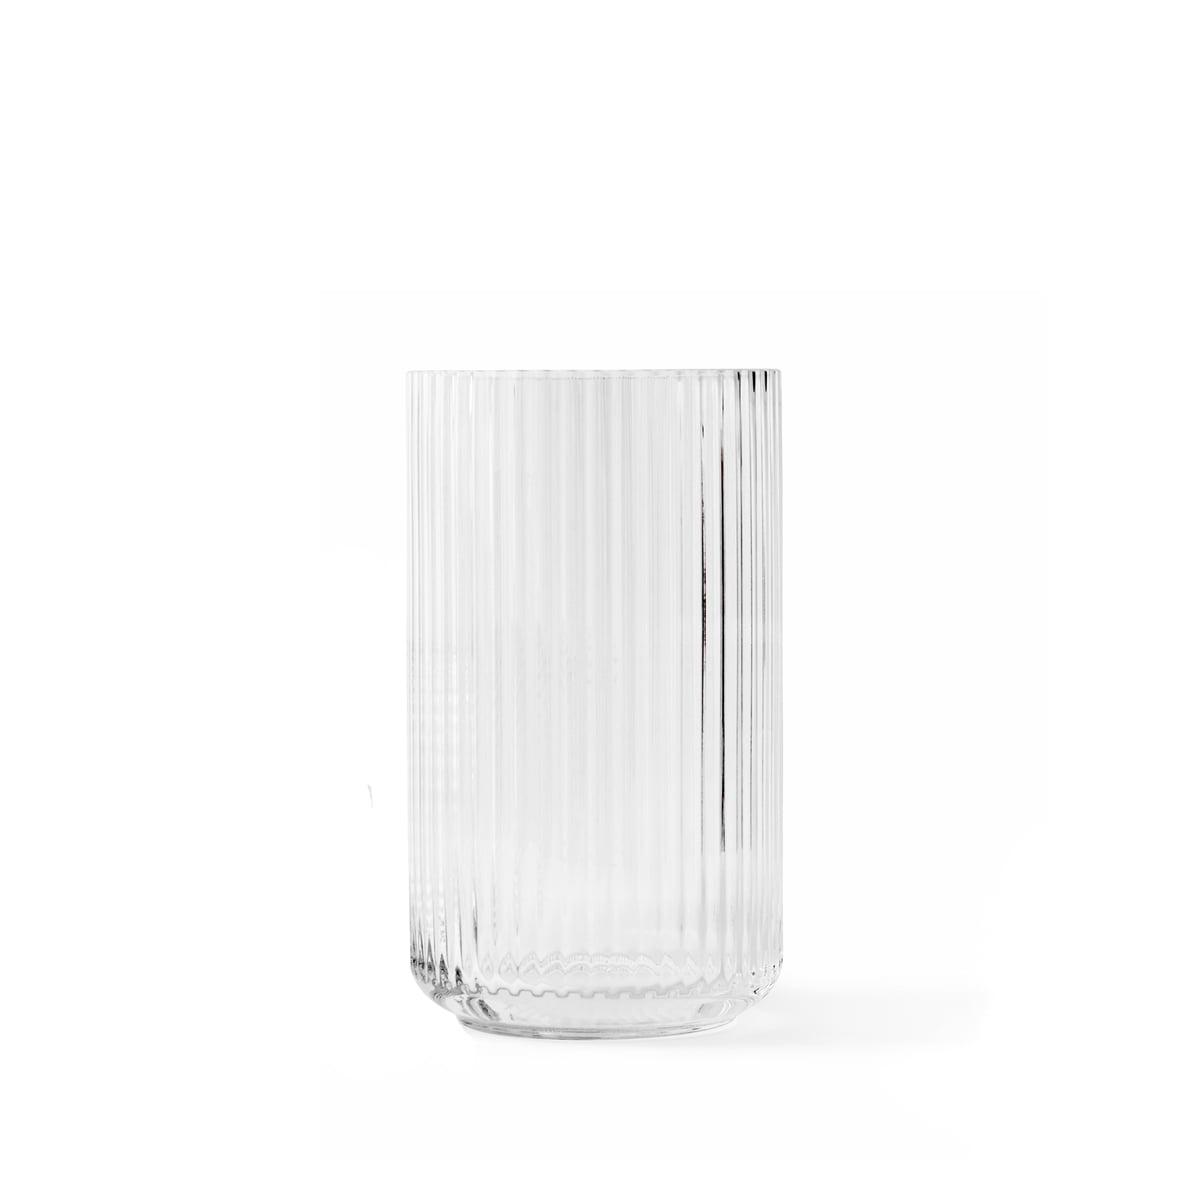 Lyngby porceln glass vase in the shop lyngby porceln glass vase transparent h 12 cm reviewsmspy